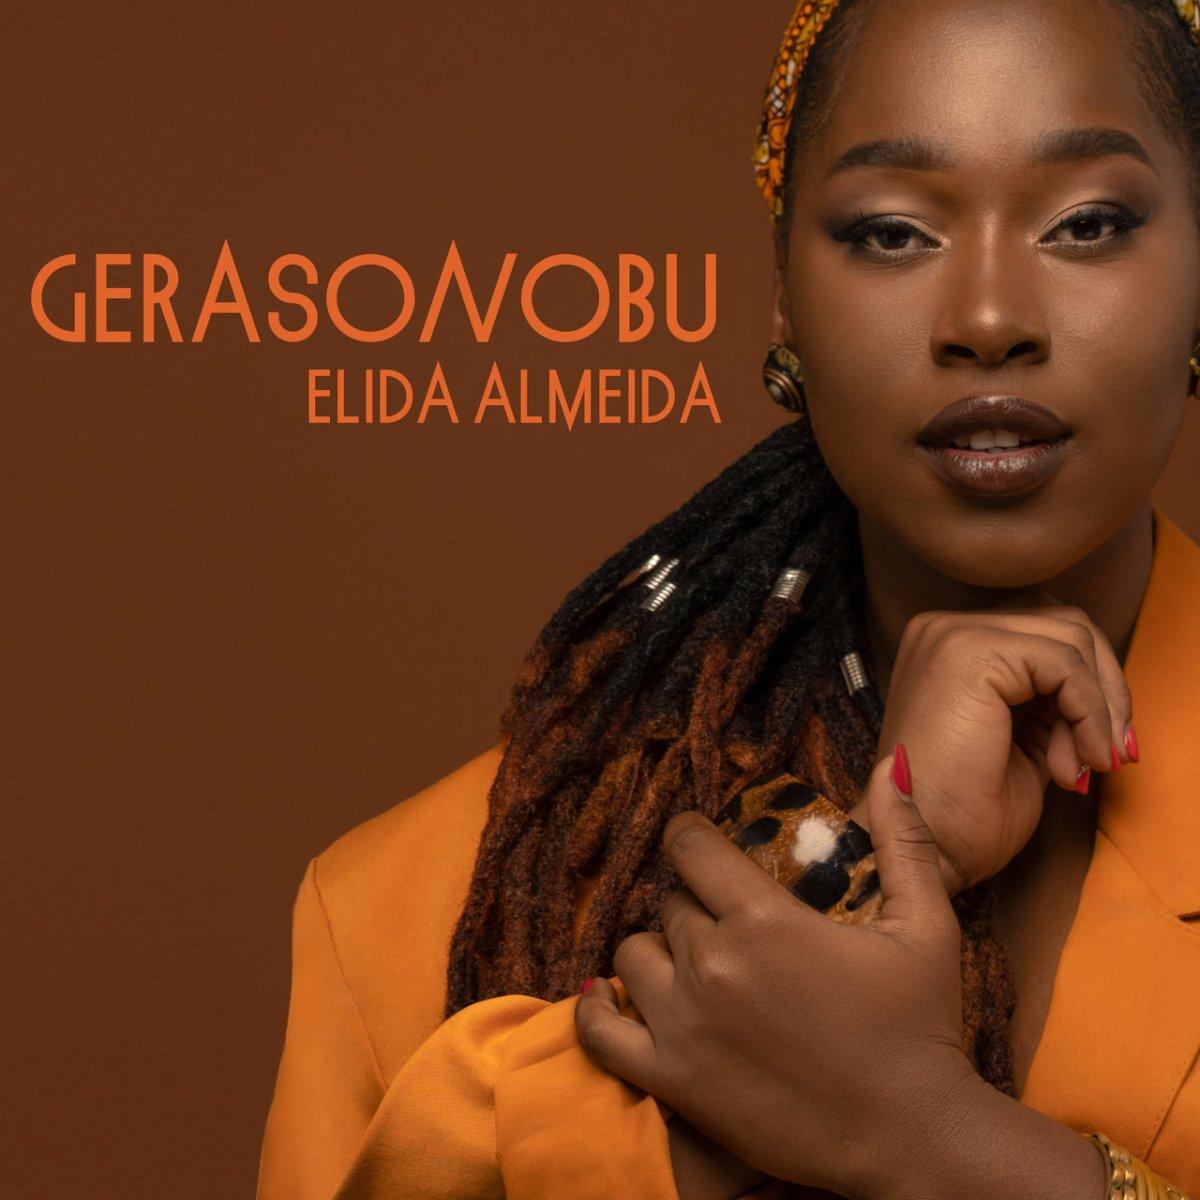 Elida Almeida - Gerasonobu (Cover)